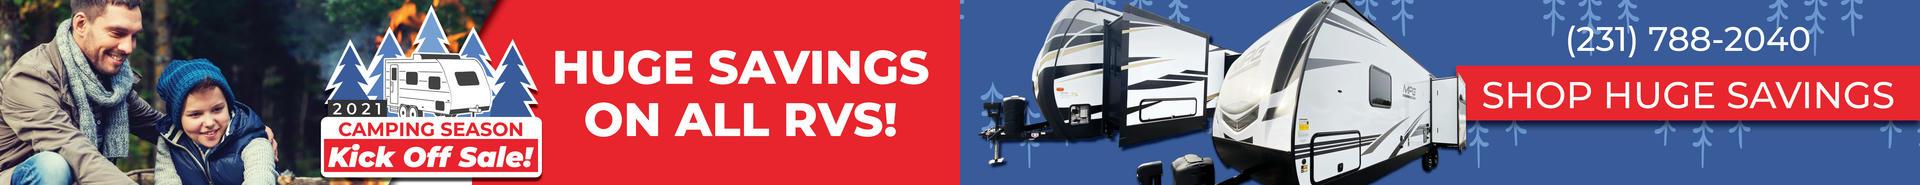 lsrv-camping-season-kickoff-sale-home-page-banner-006